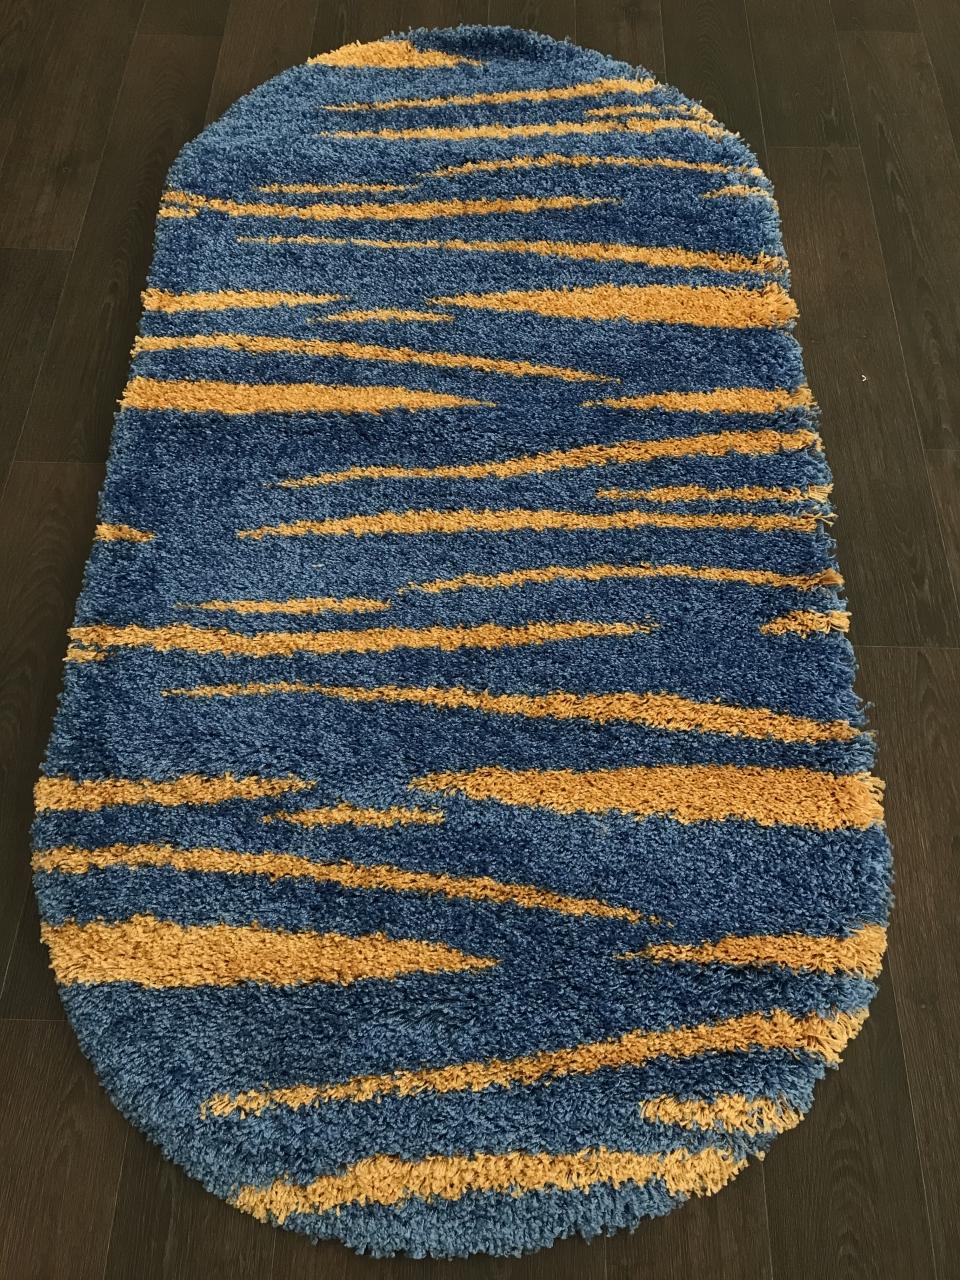 SHAGGY ULTRA - S608 - BLUE-YELLOW